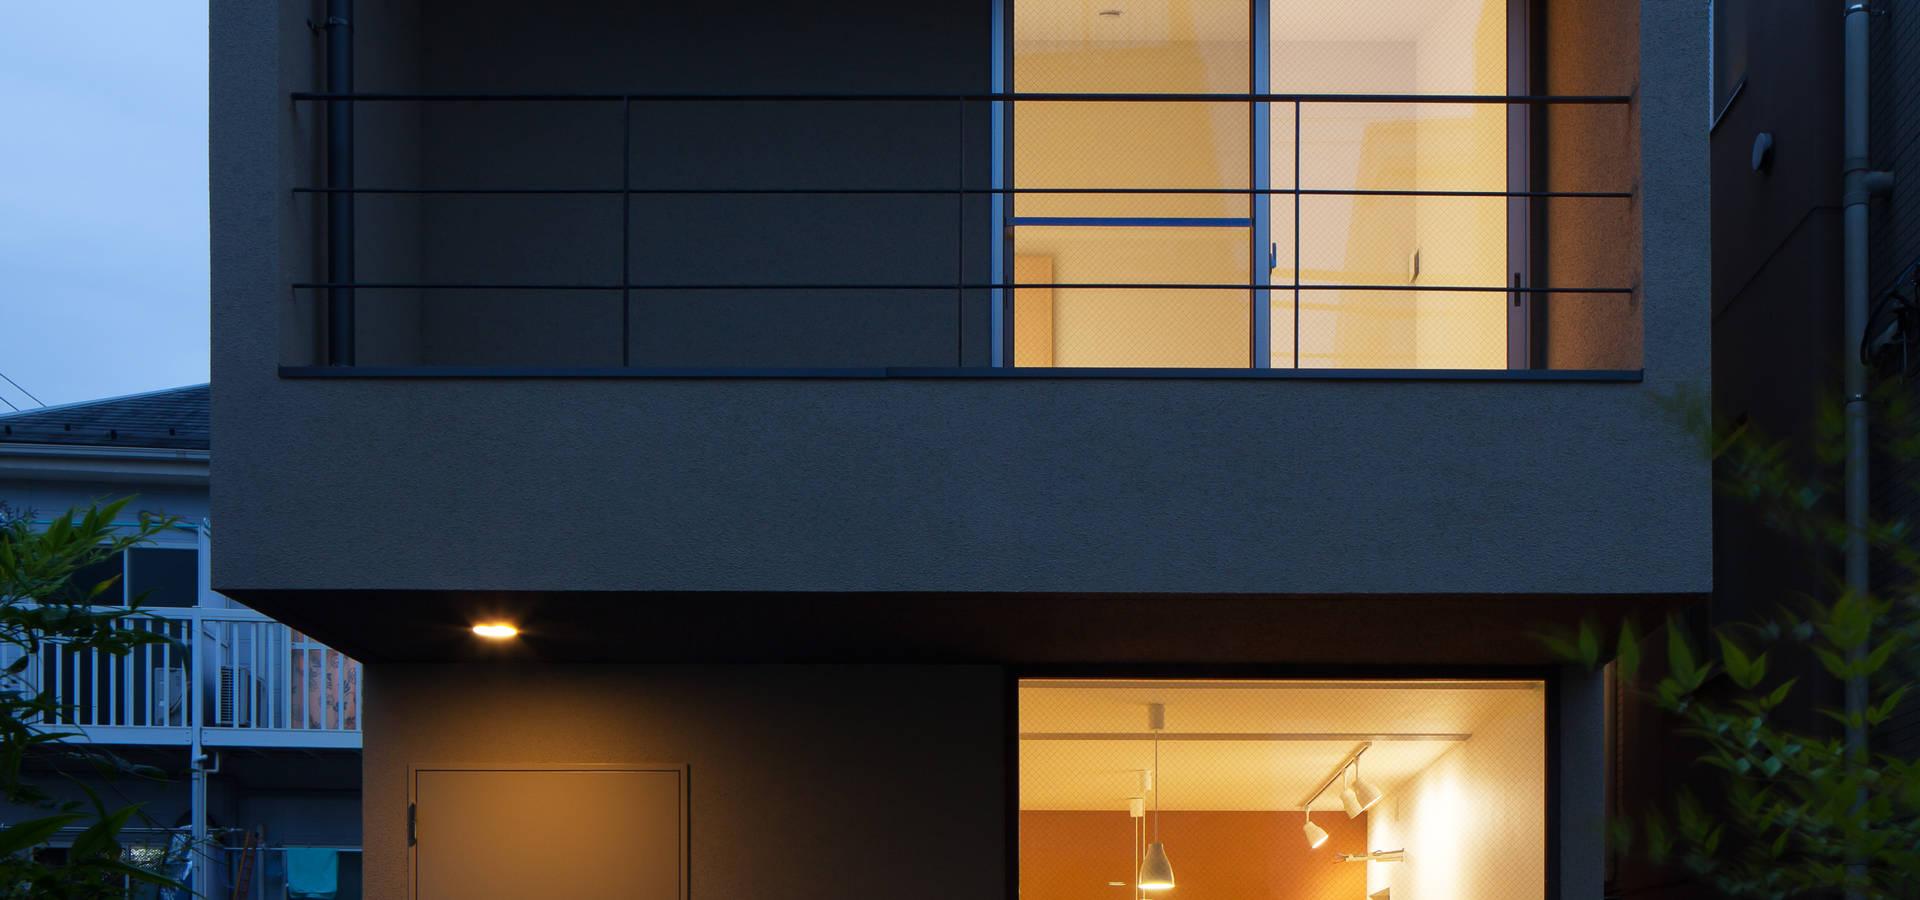 荻原雅史建築設計事務所 / Masashi Ogihara Architect & Associates